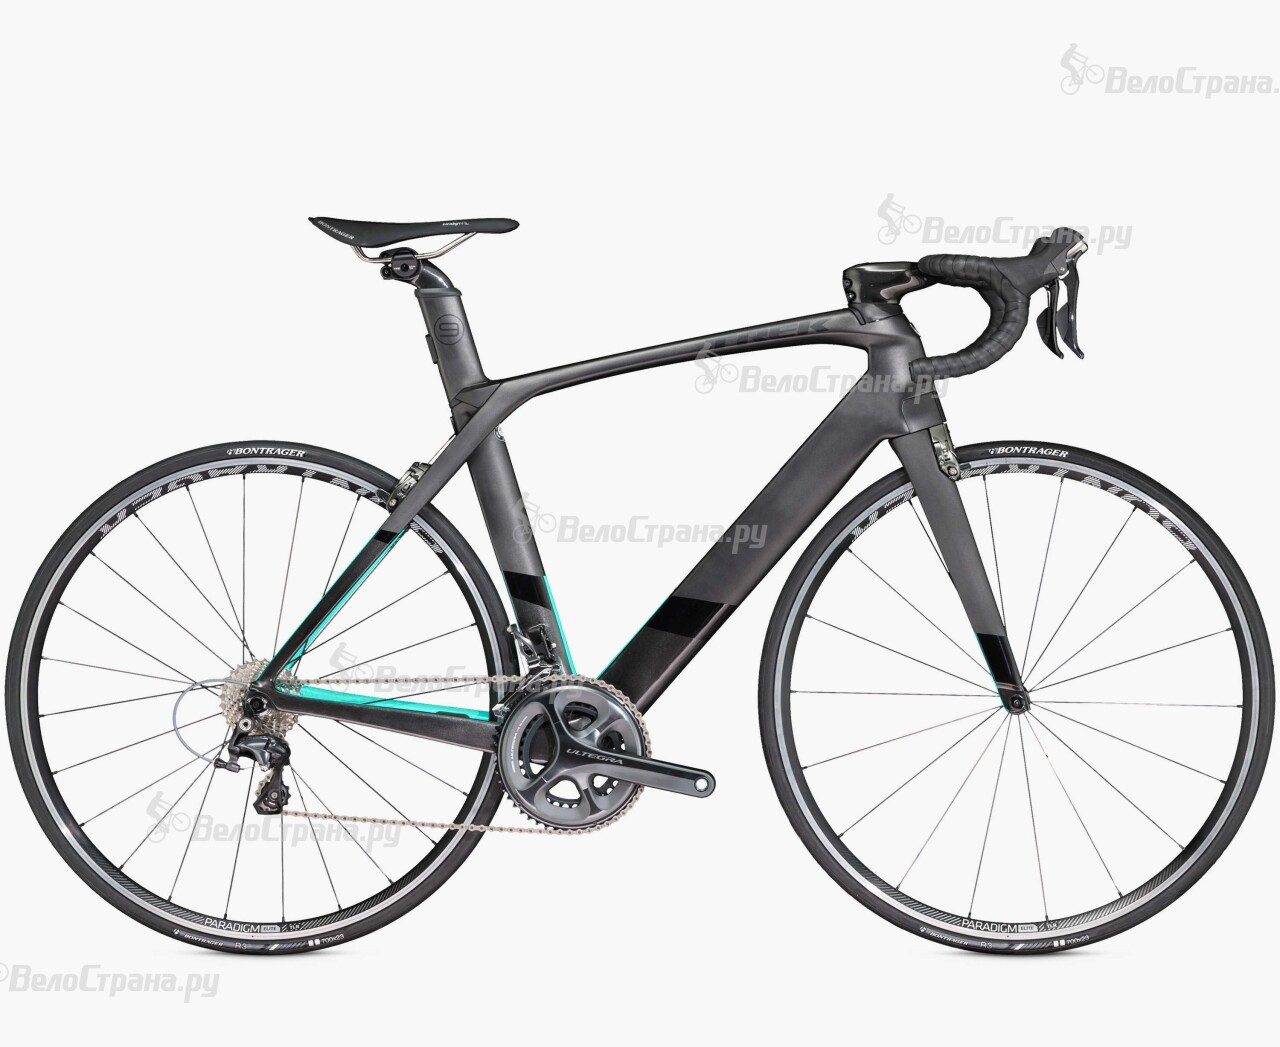 Велосипед Trek Madone 9.2 (2016) велосипед trek madone 5 9 2013